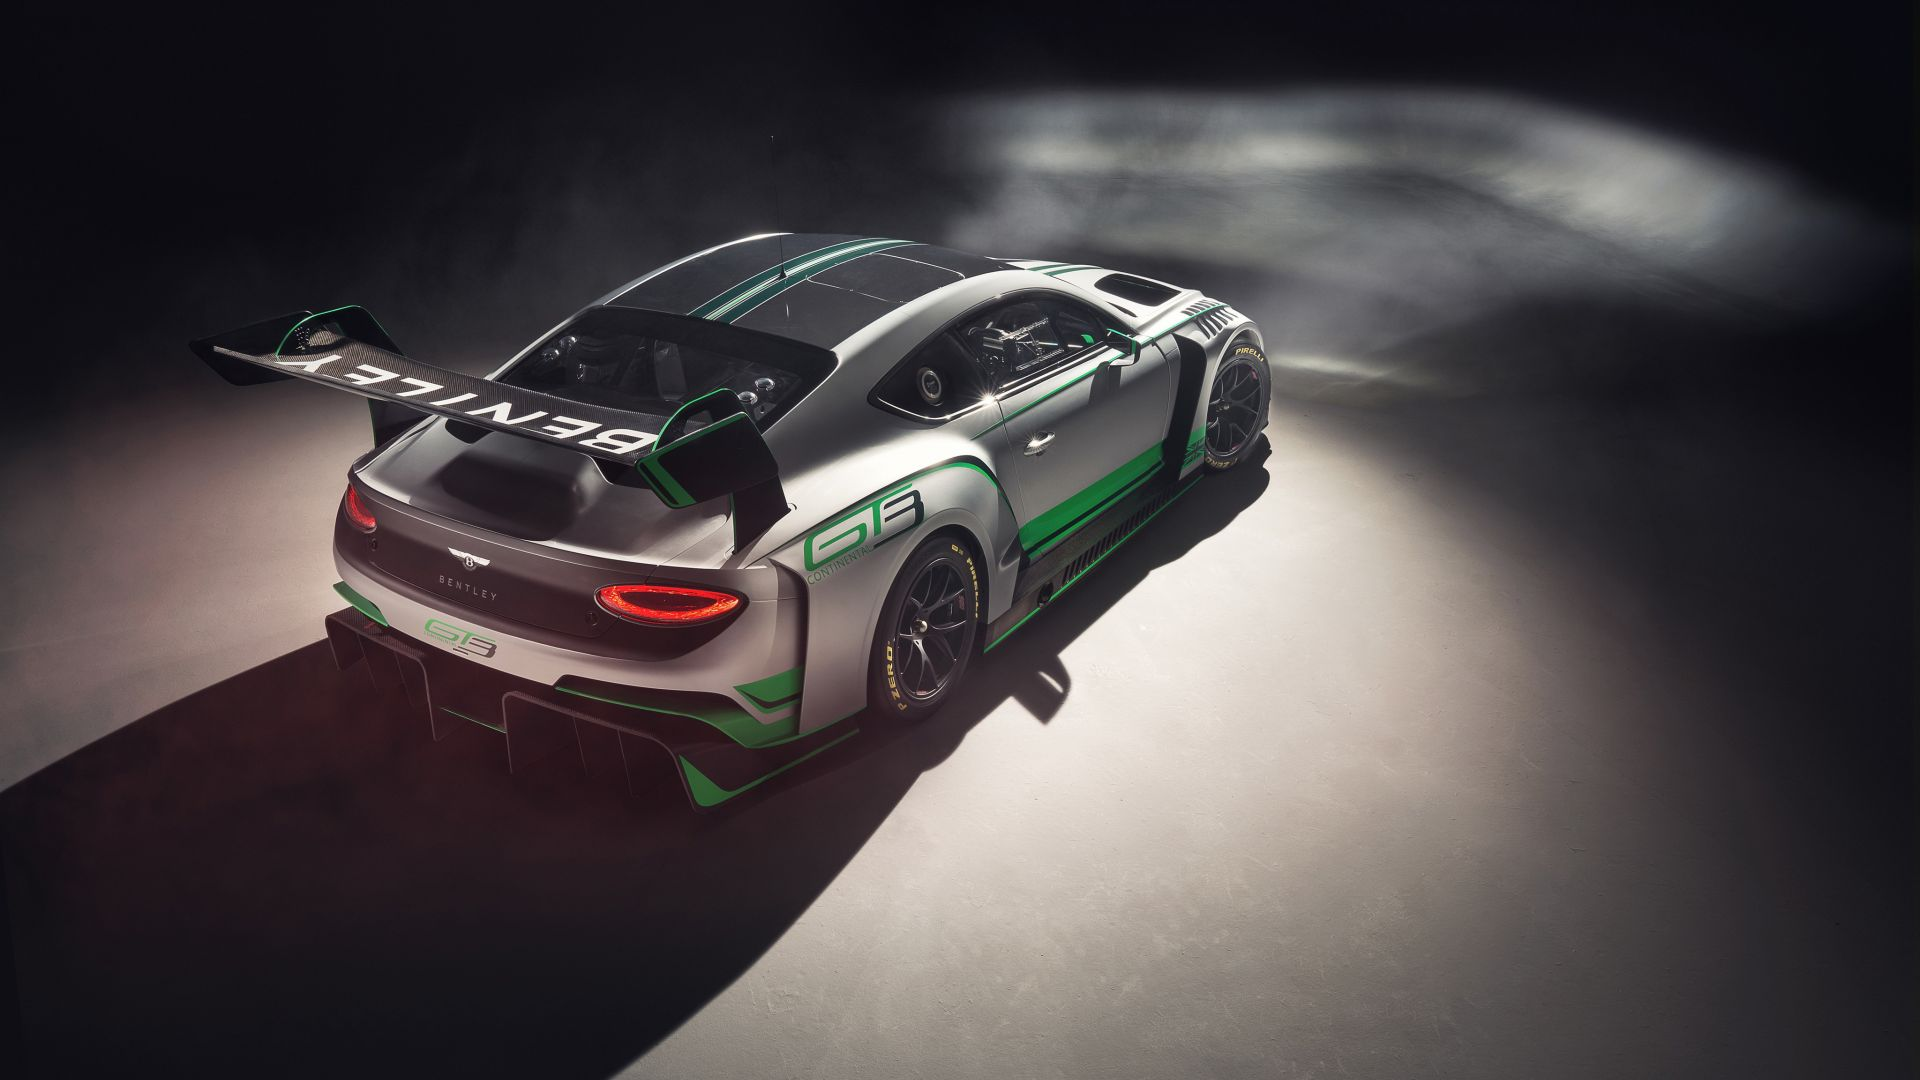 Wallpaper Bentley continental GT3, sports car, rear, 2018, 4k